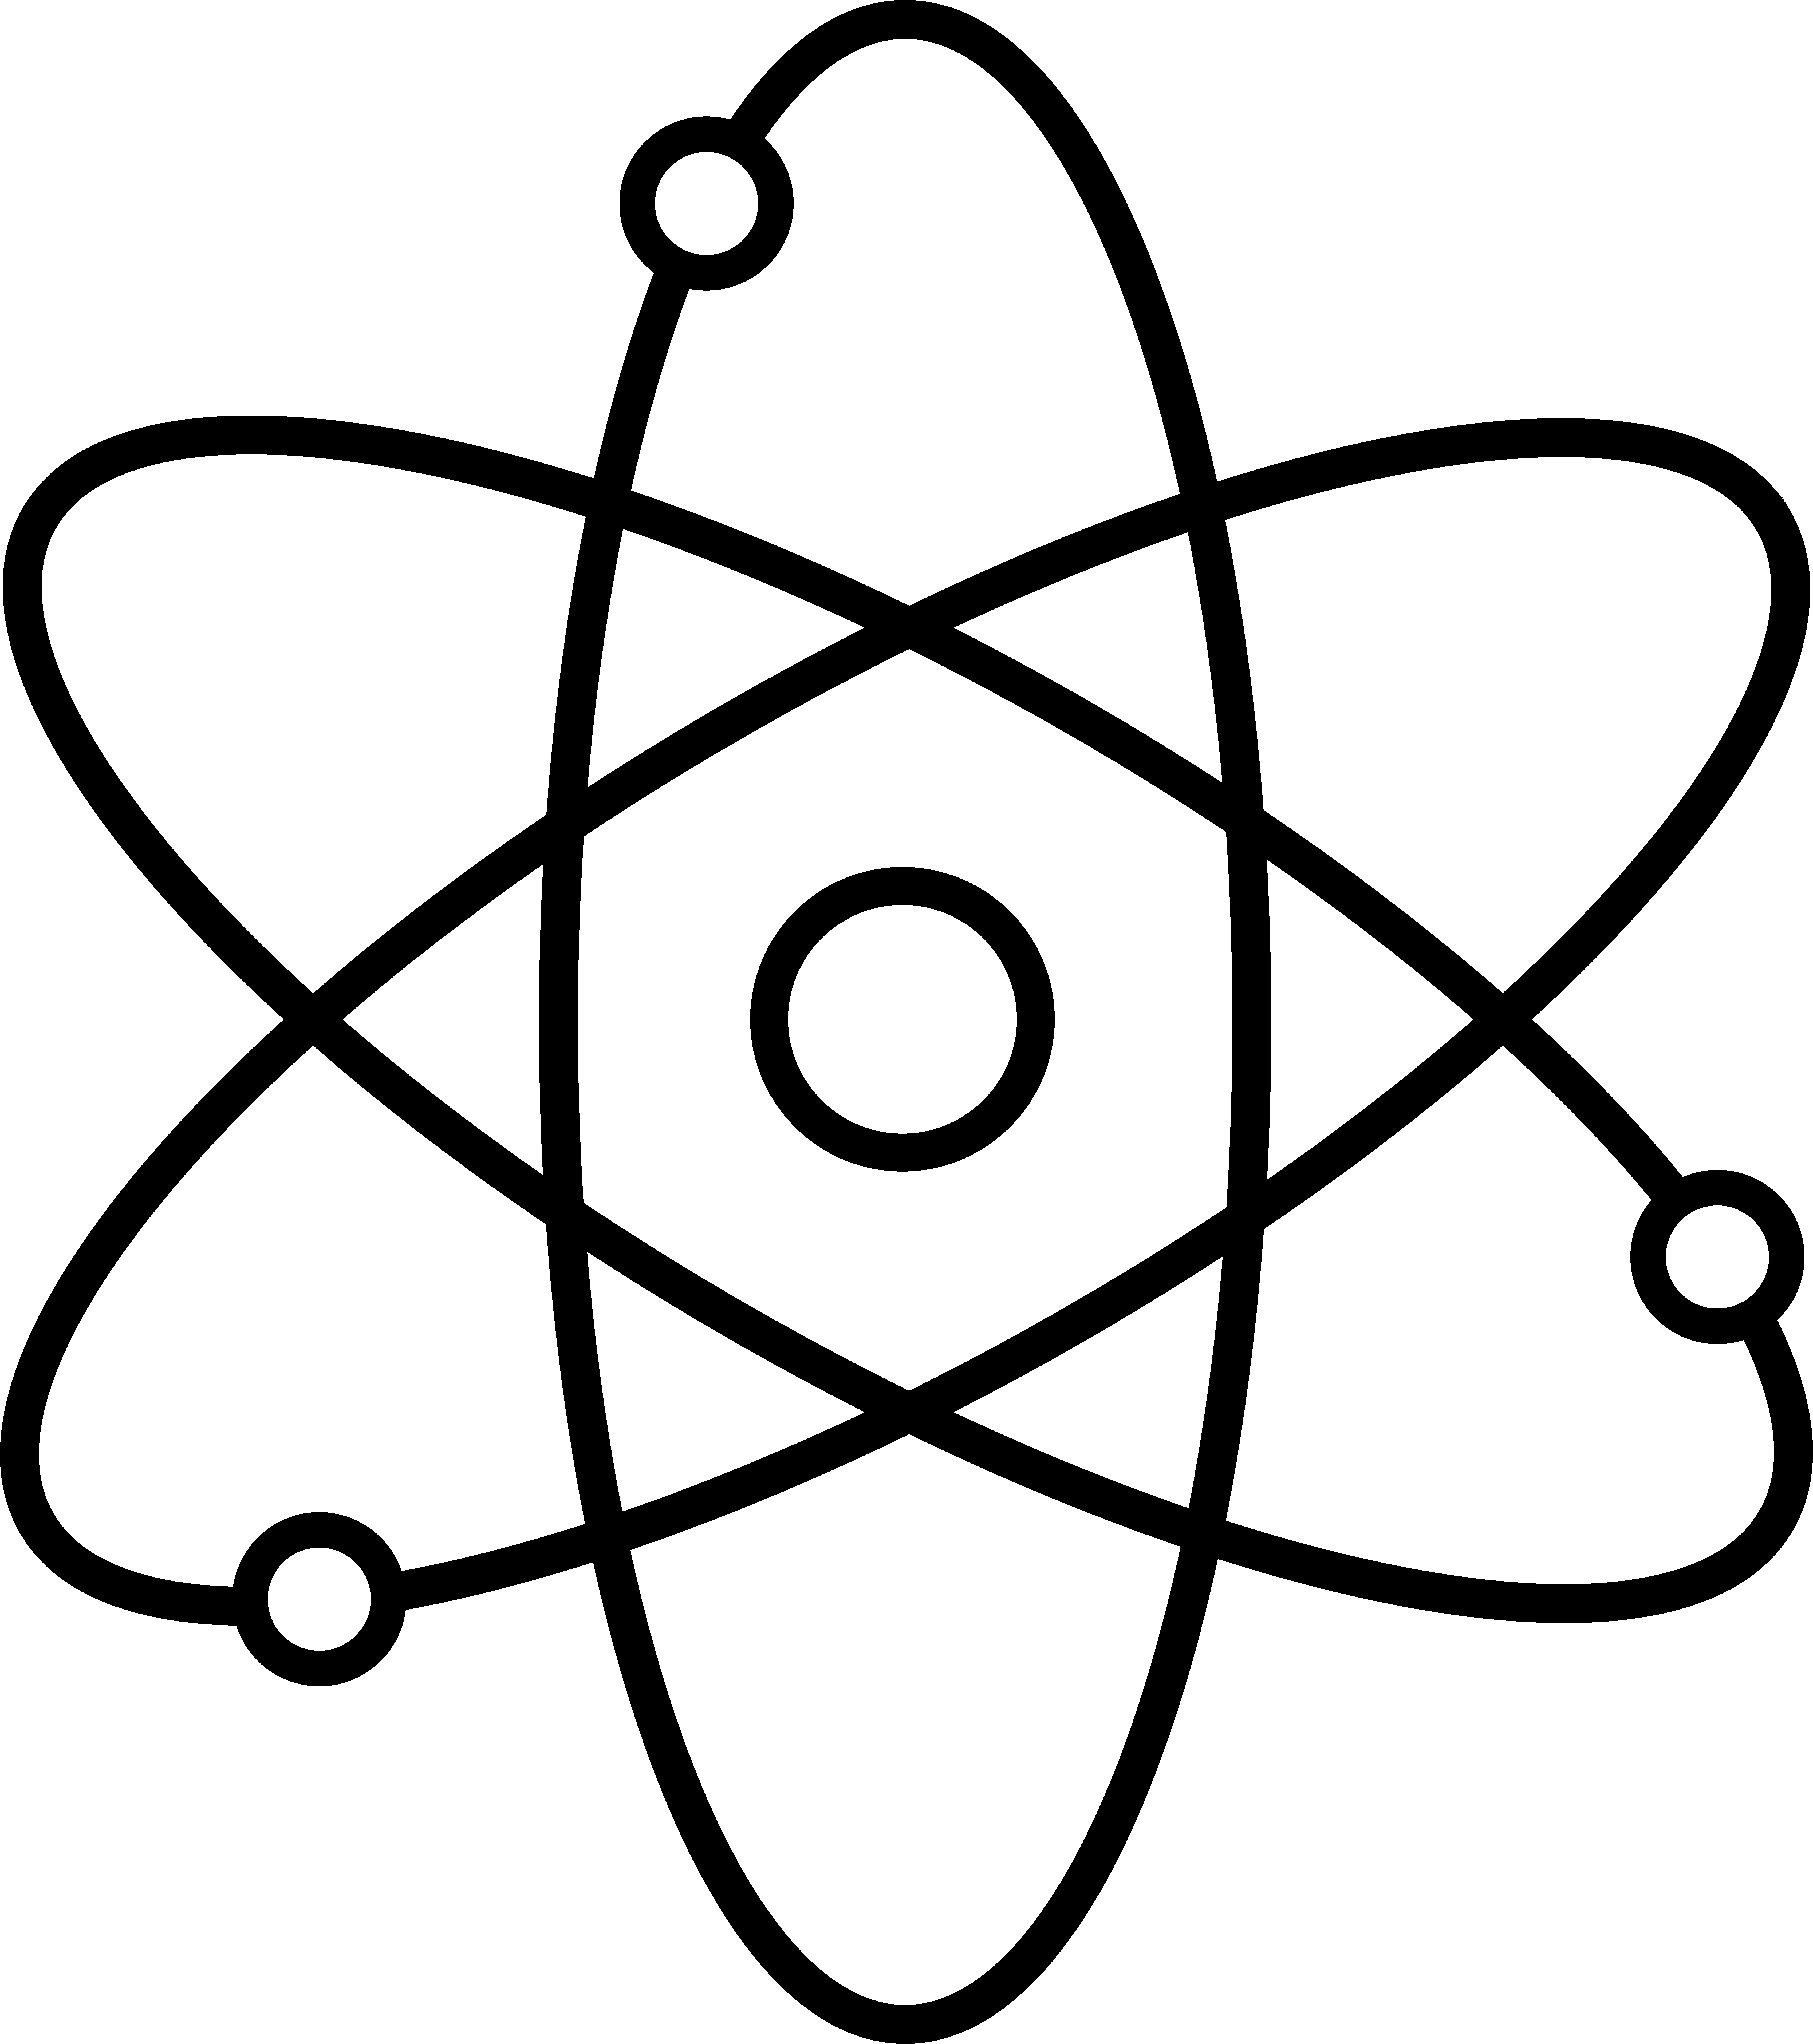 6792x7659 Atom Symbol Line Art